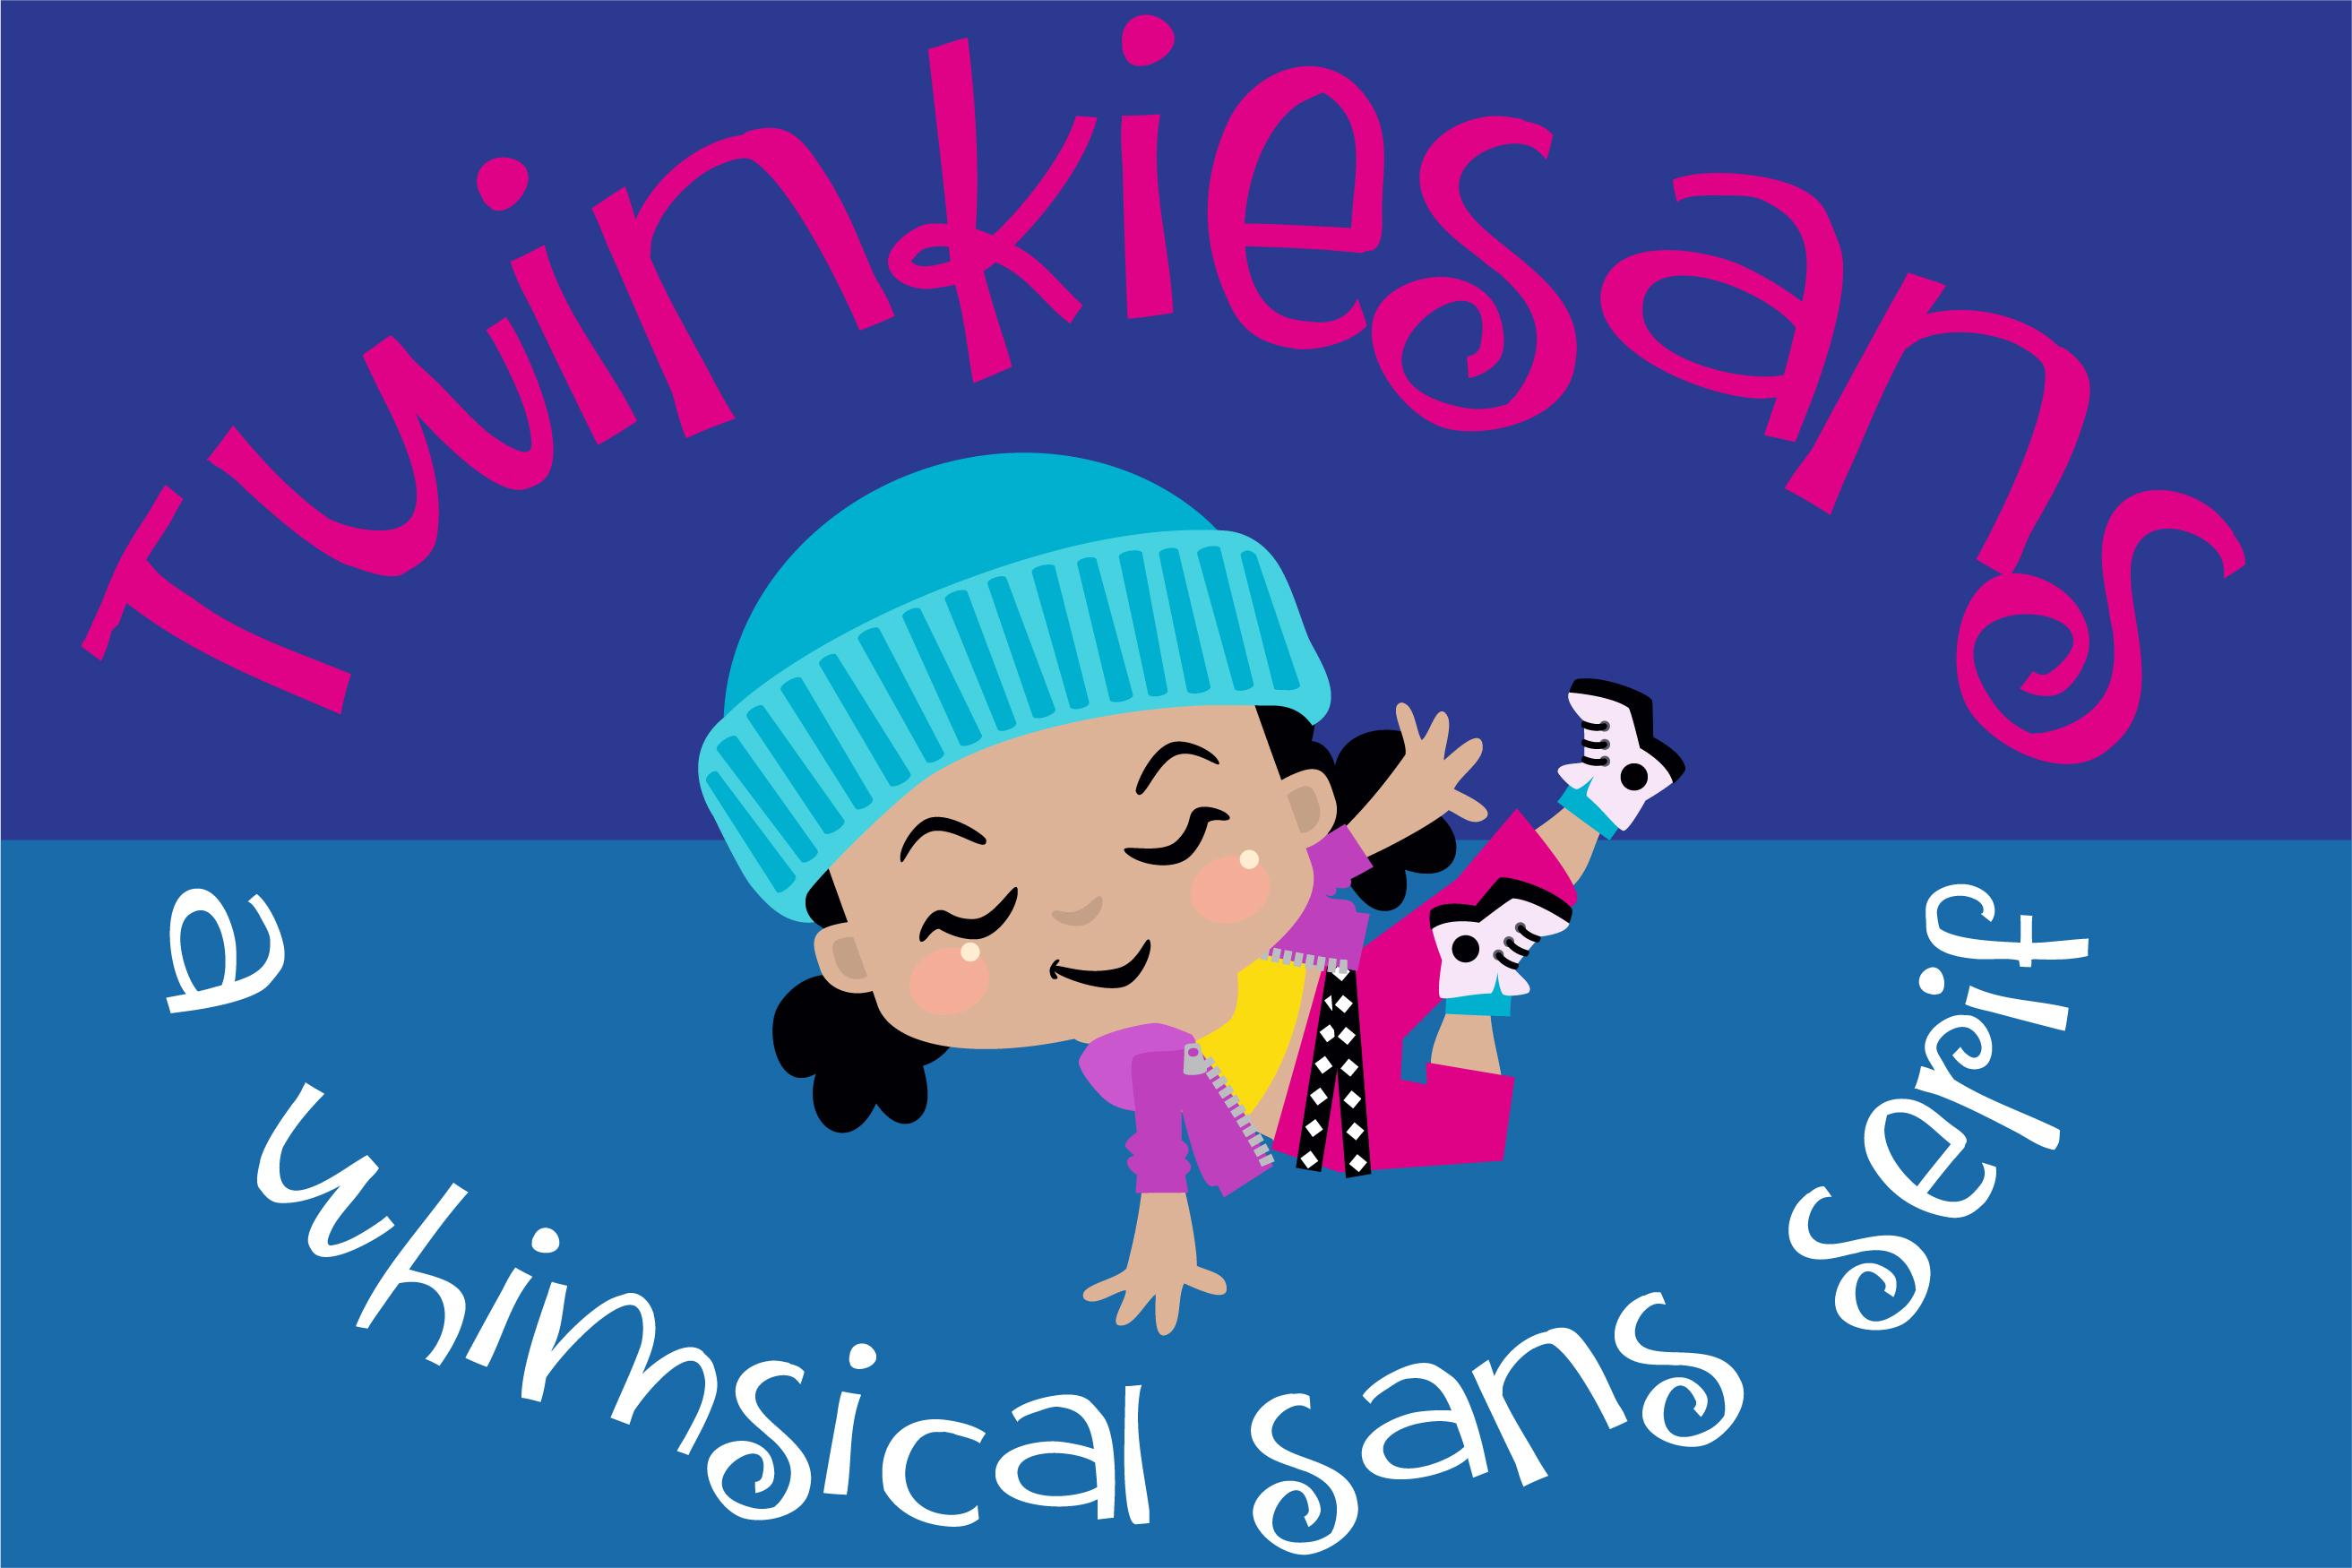 ZP Twinkiesans example image 1